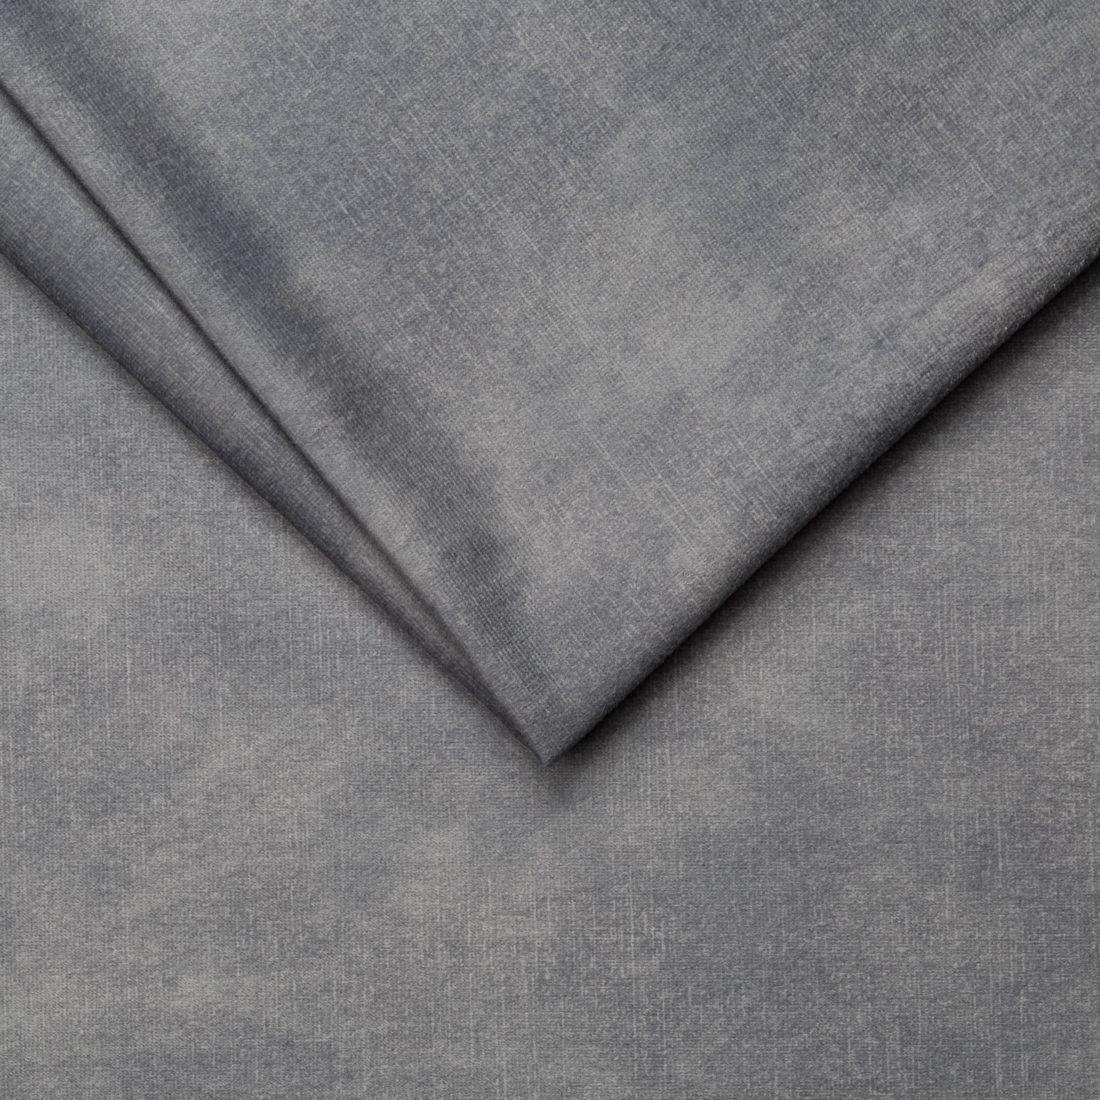 Меблева тканина Palladium 15 Moon Mist, велюр